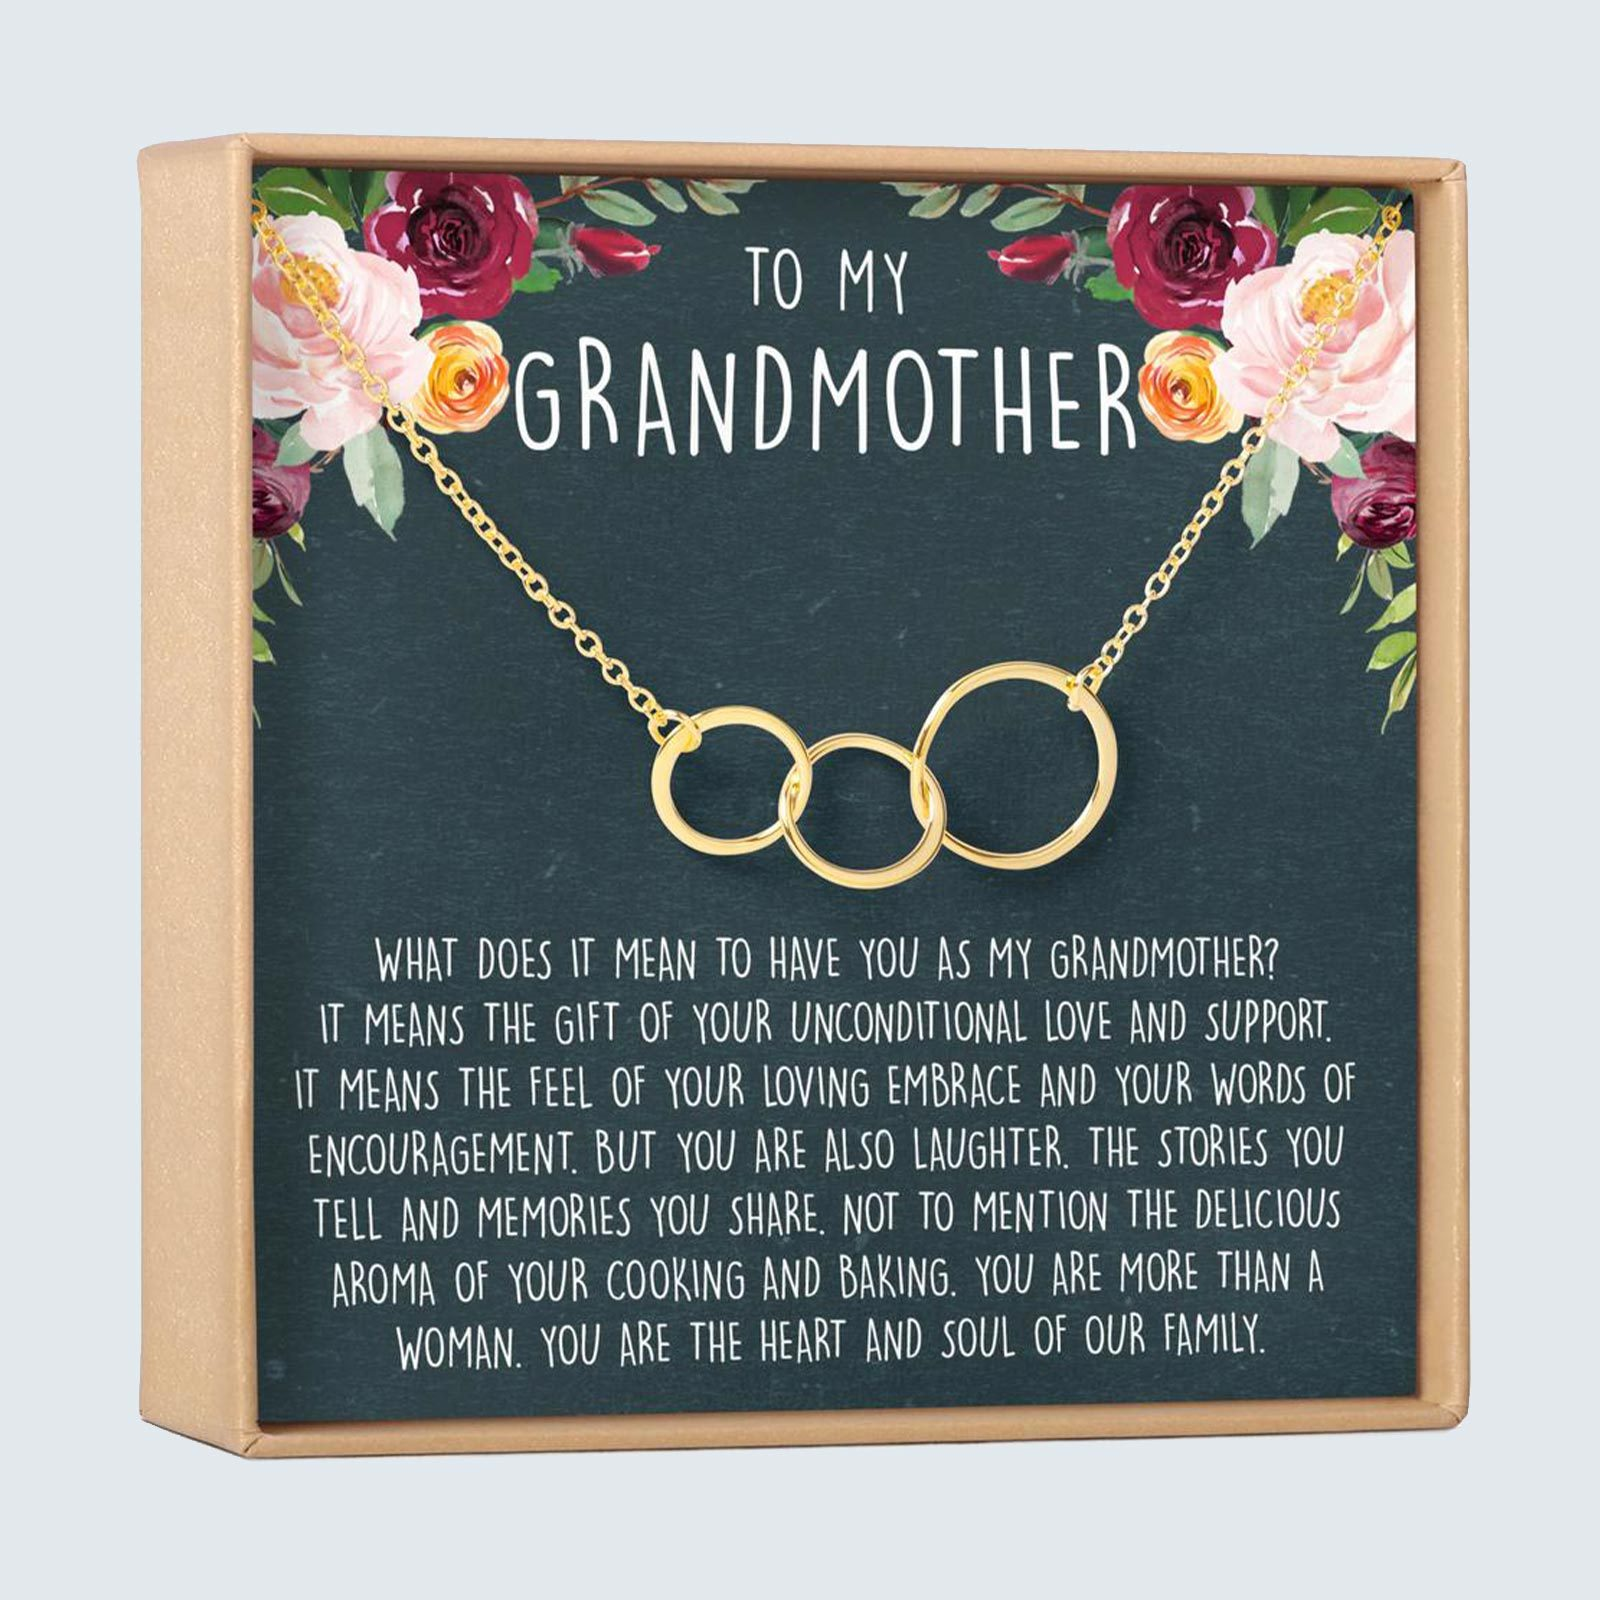 Grandparents gift idea